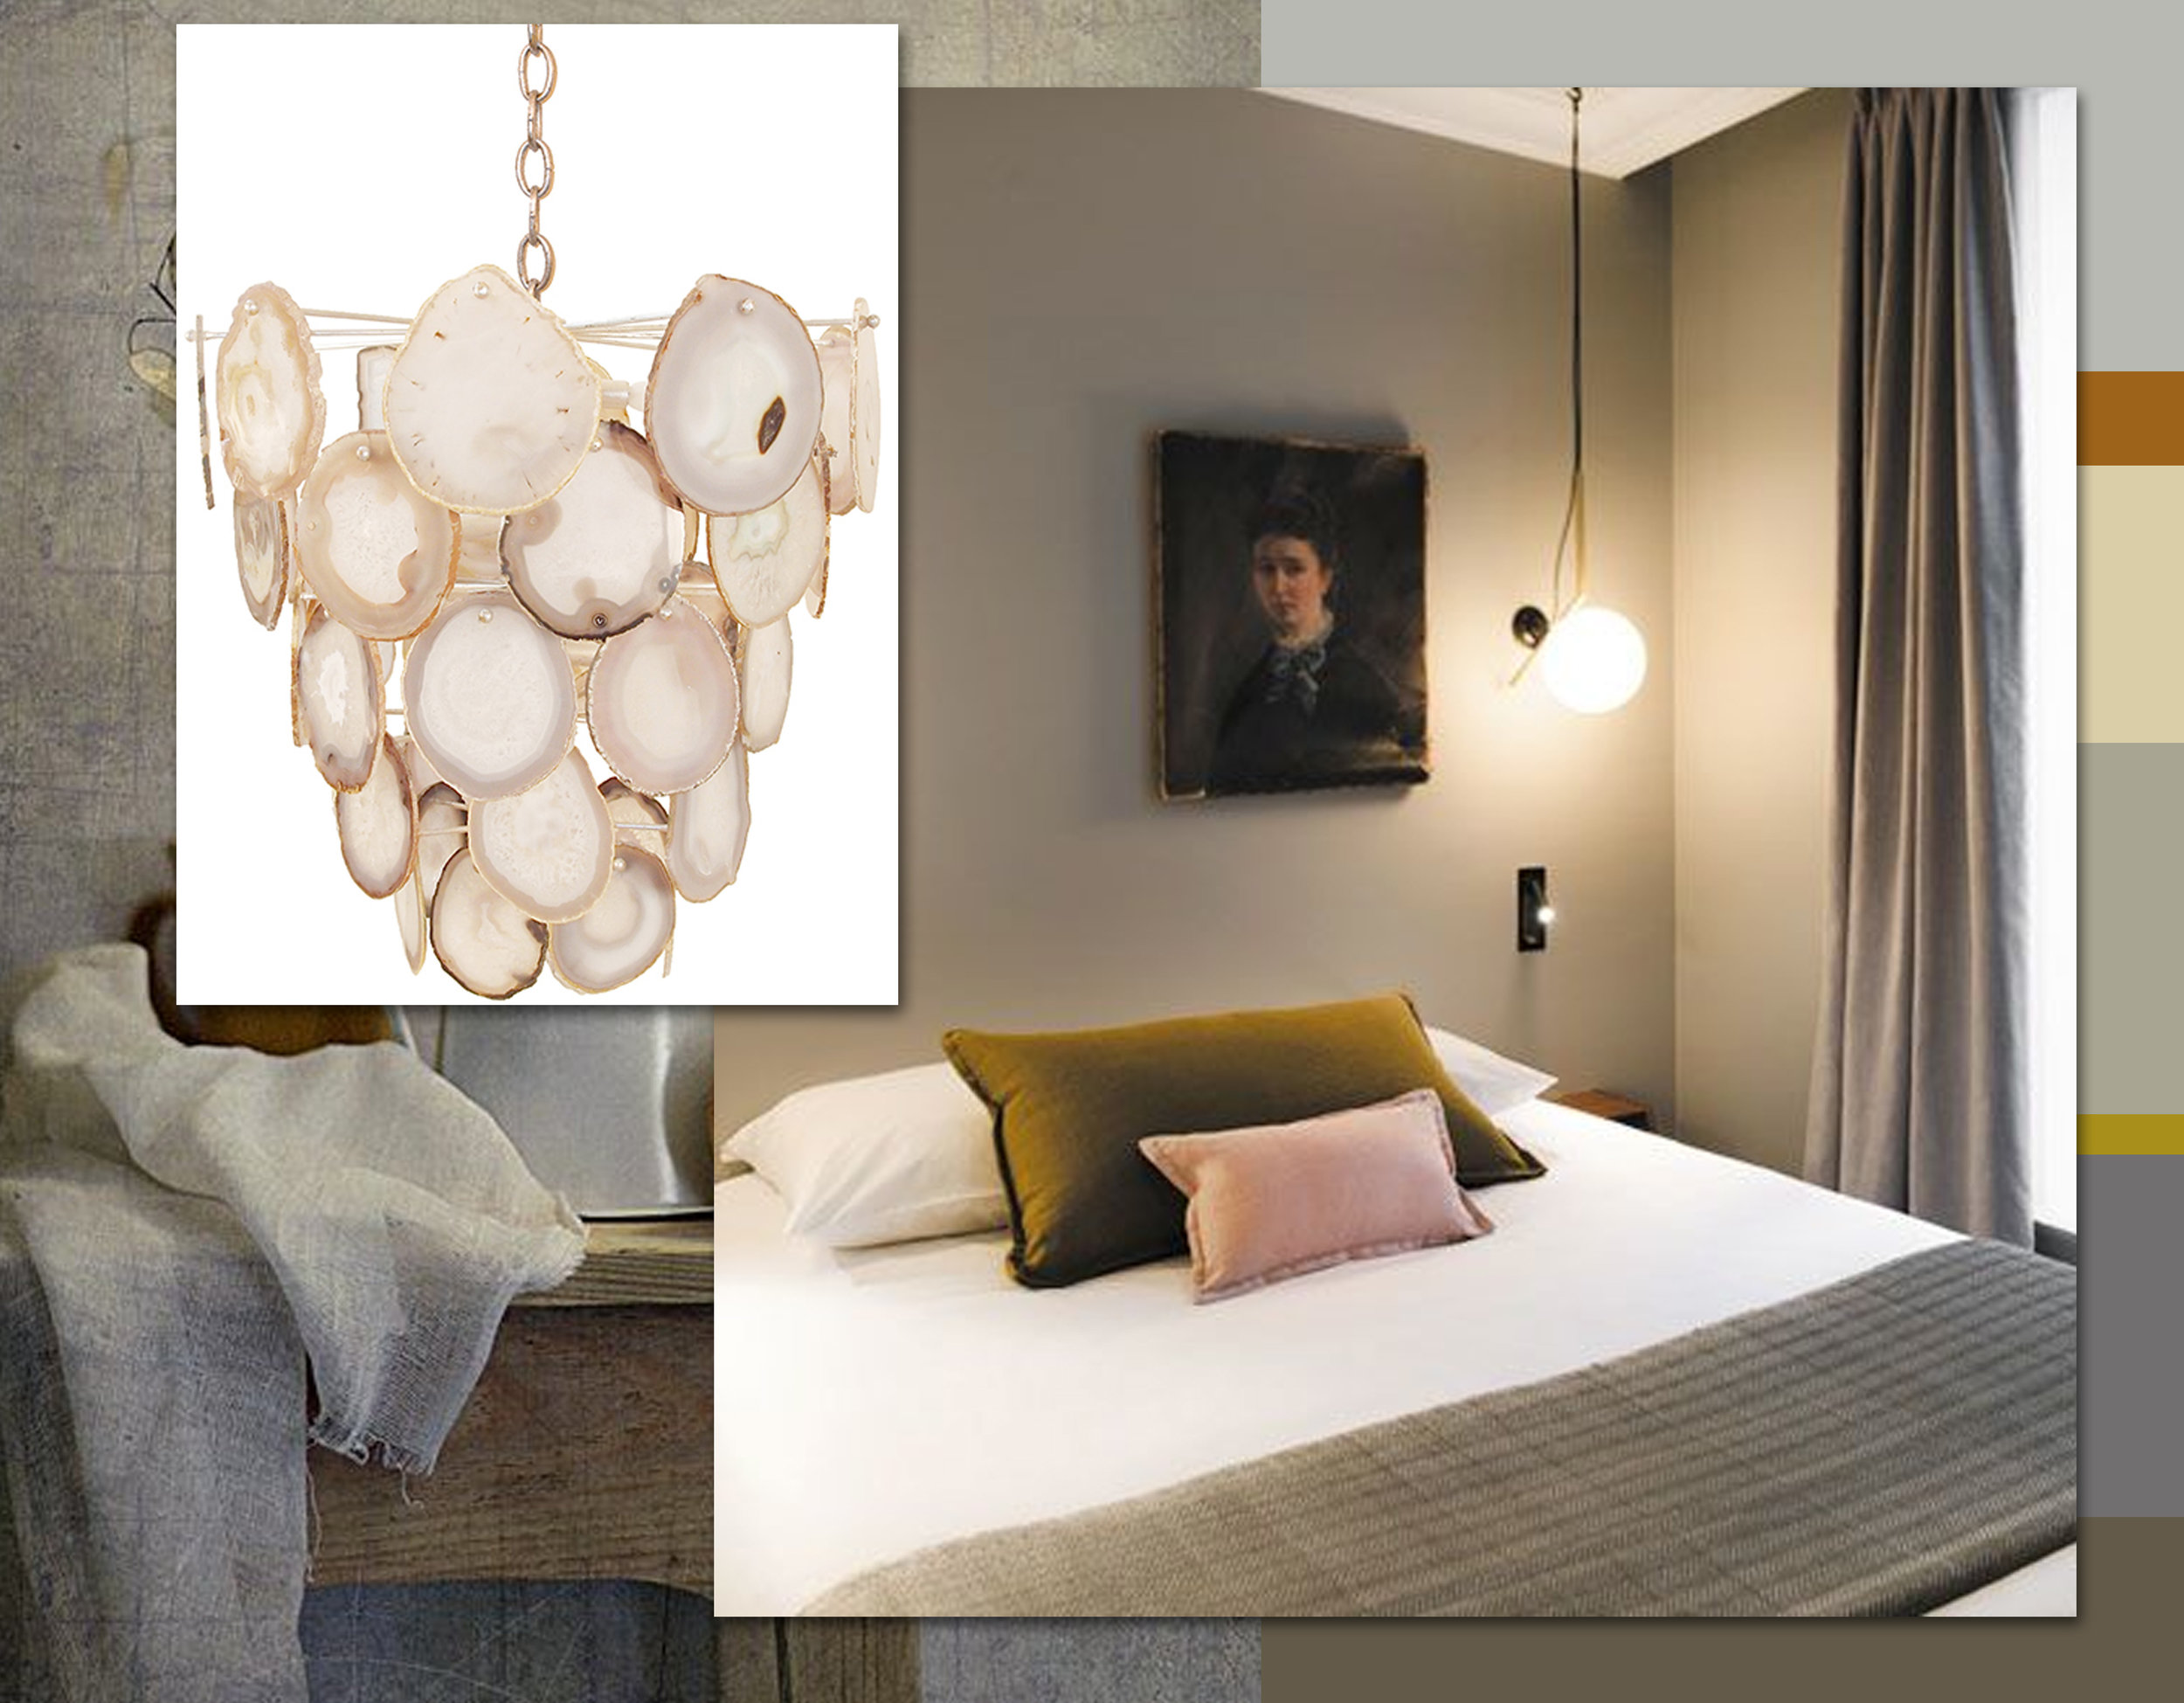 Bebe chandelier  Marjorie Skouras Design  - interior C.O.Q hotel via  Tablet